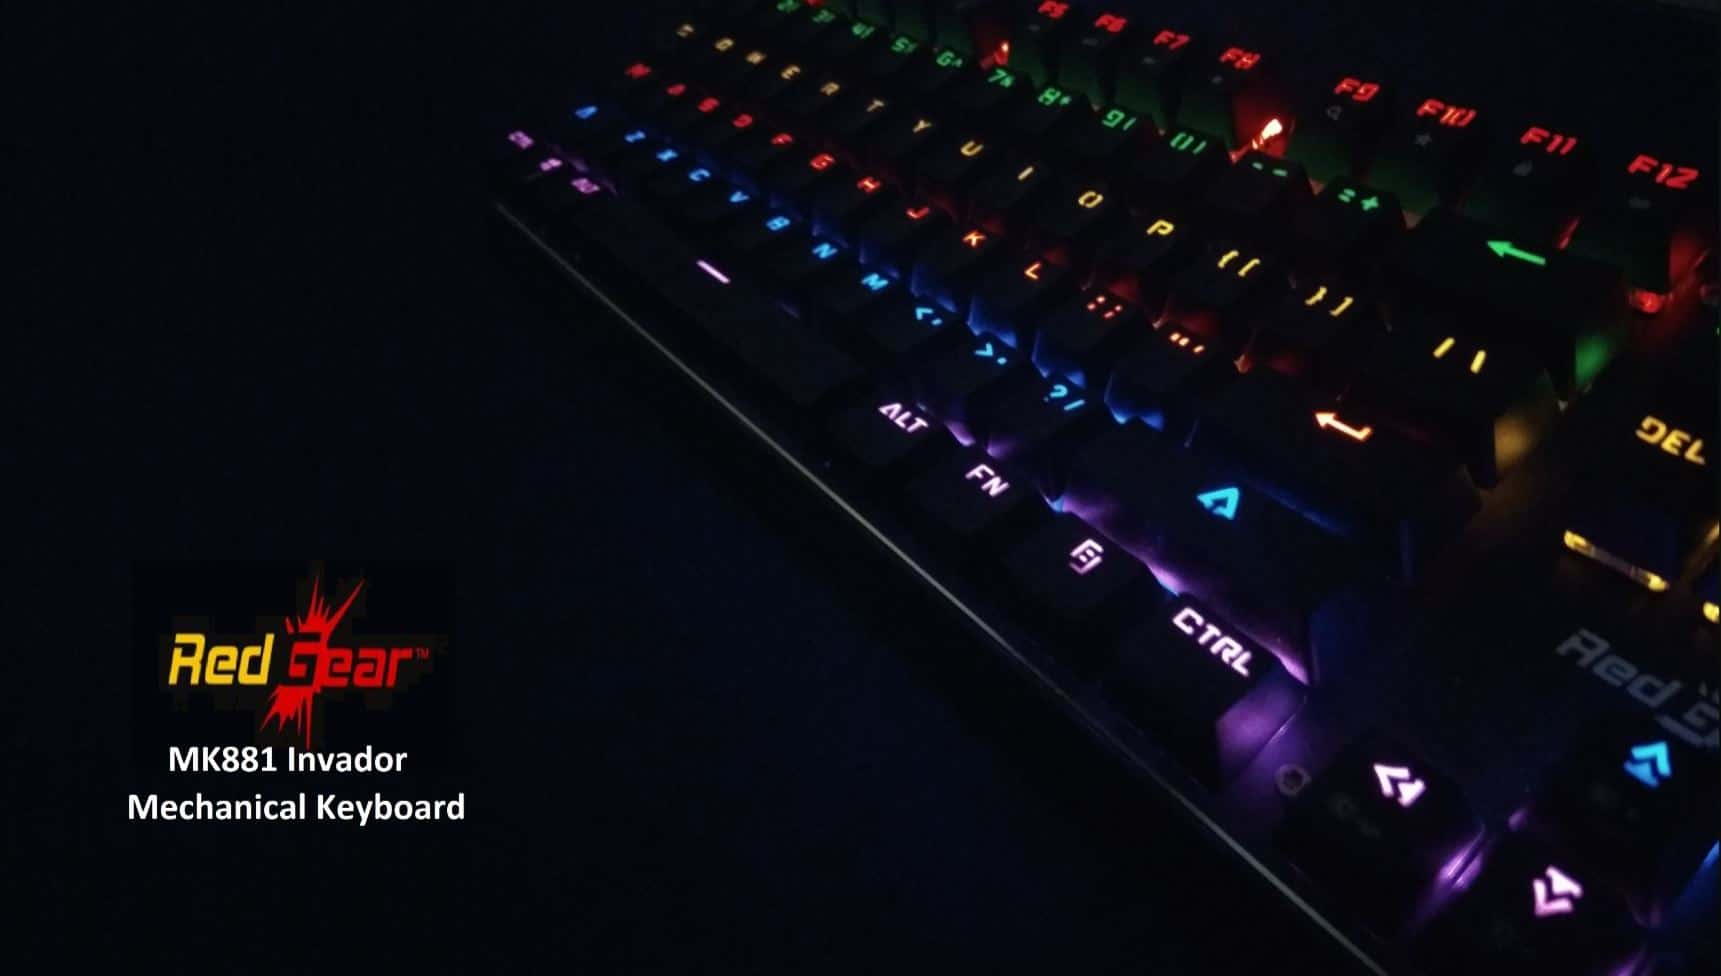 Redgear MK881 Invador Mechanical Keyboard